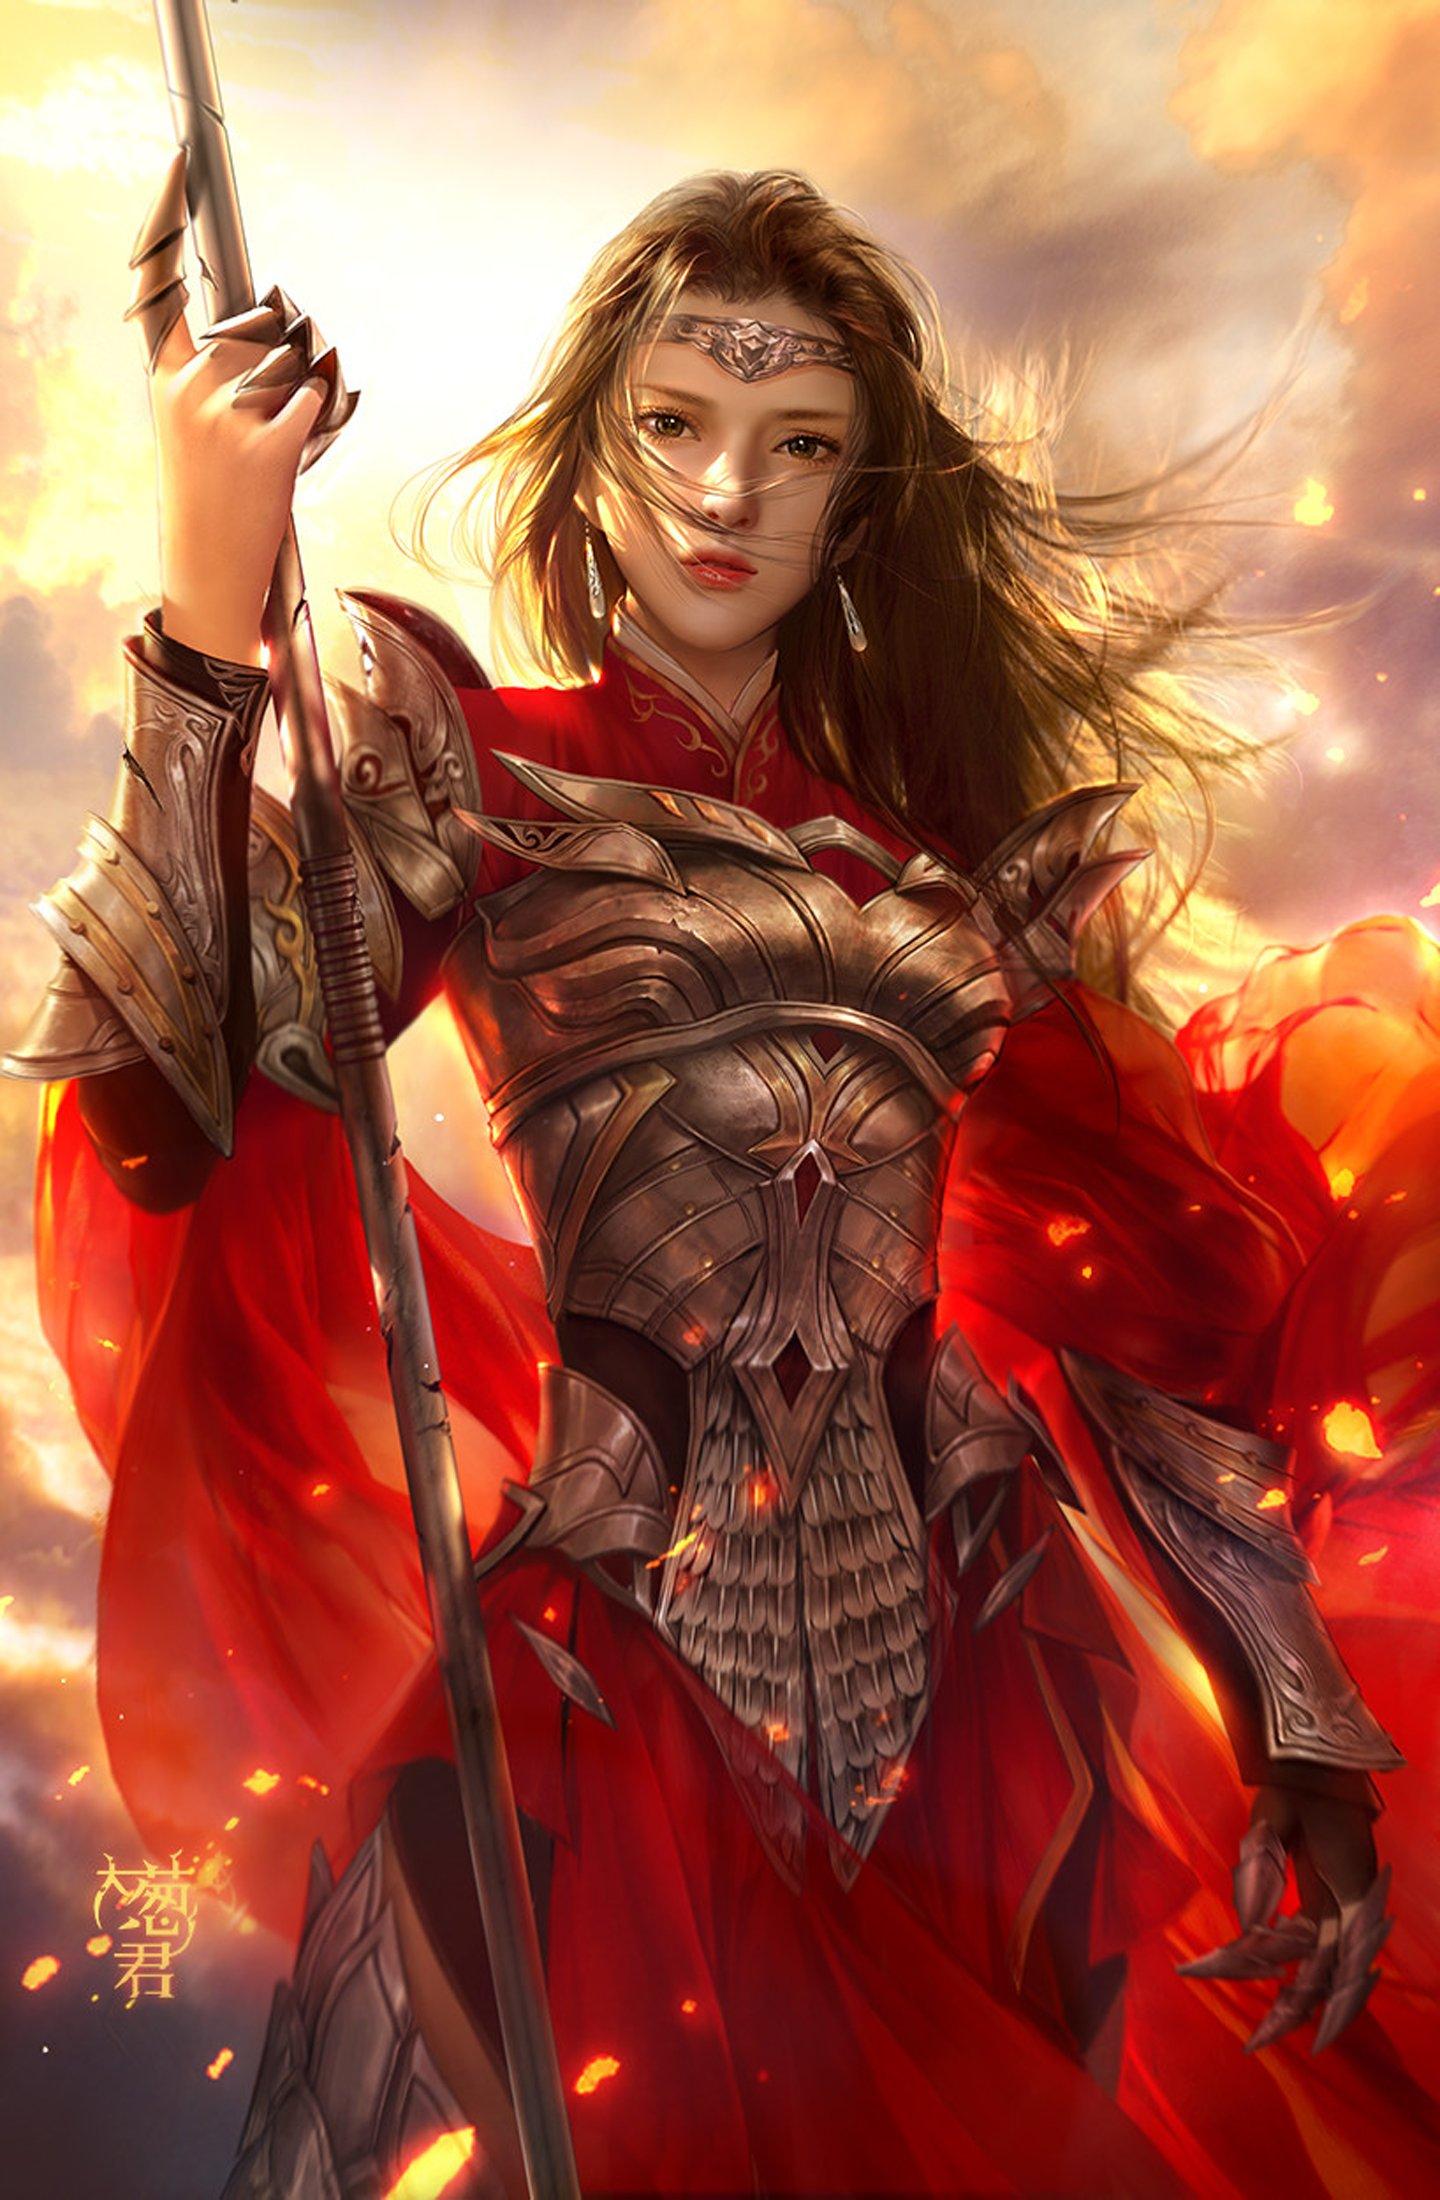 Fantasy Women Warrior Woman Wallpaper 197646 : Wallpapers13.com